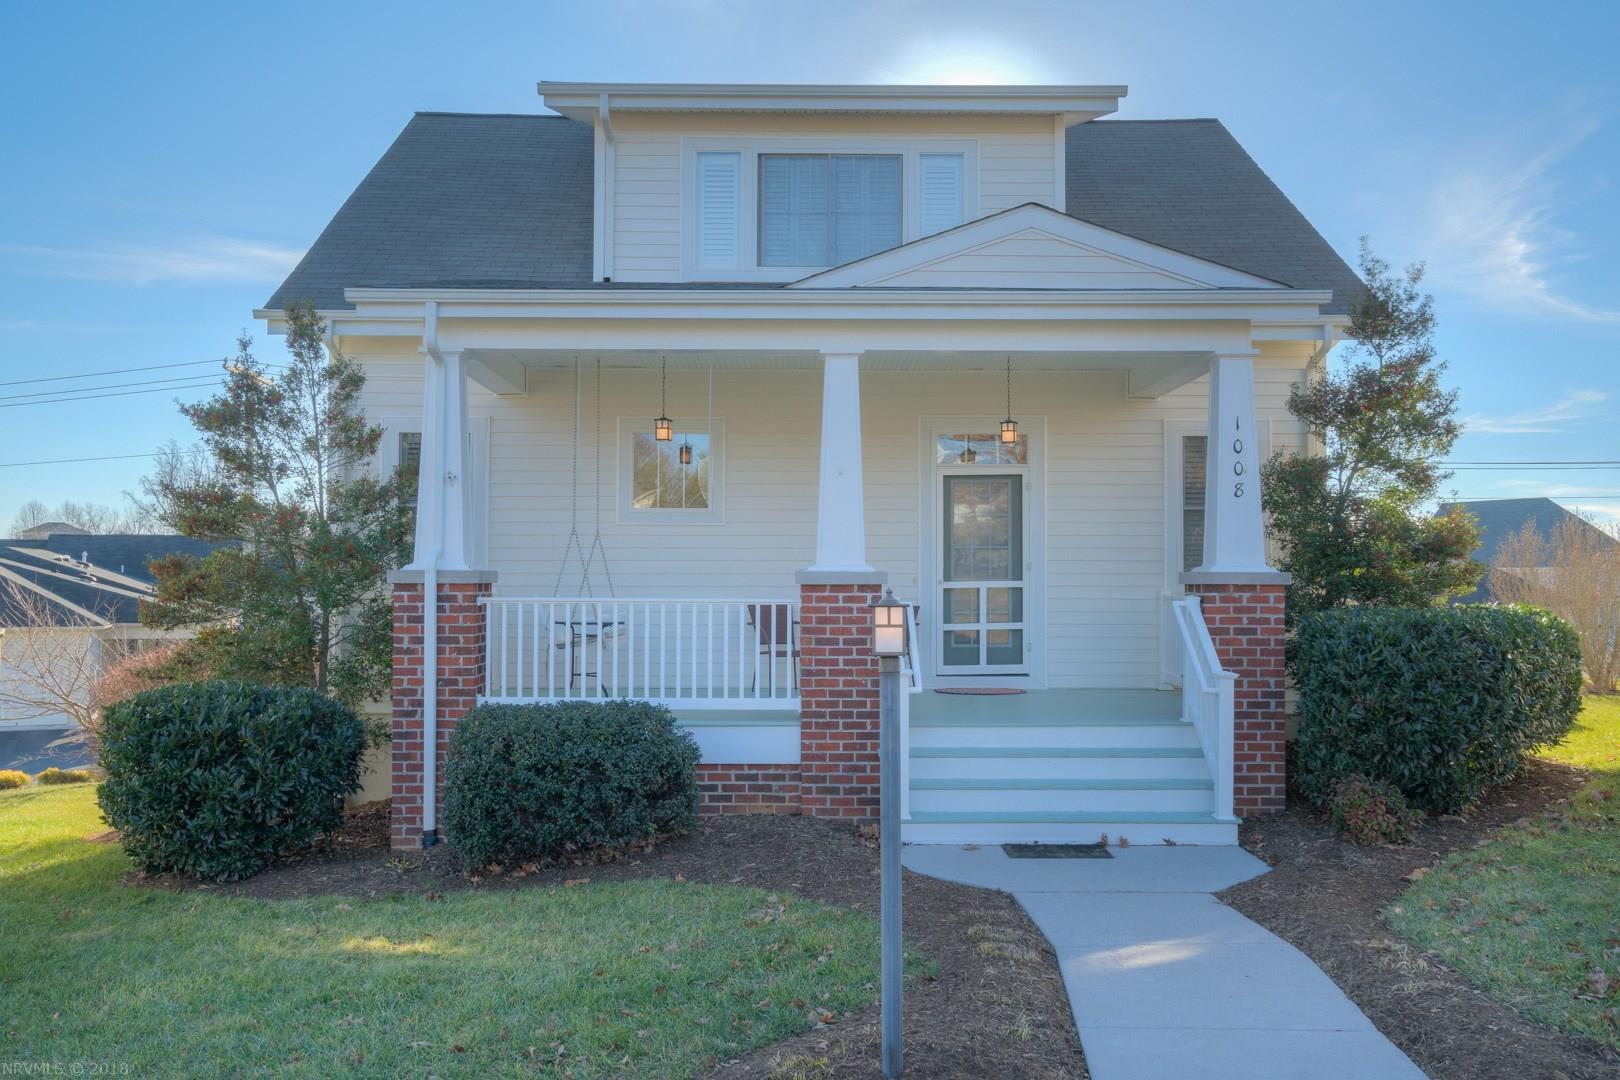 1008 Village Way N, Blacksburg, VA 24060 - Estimate and Home Details ...